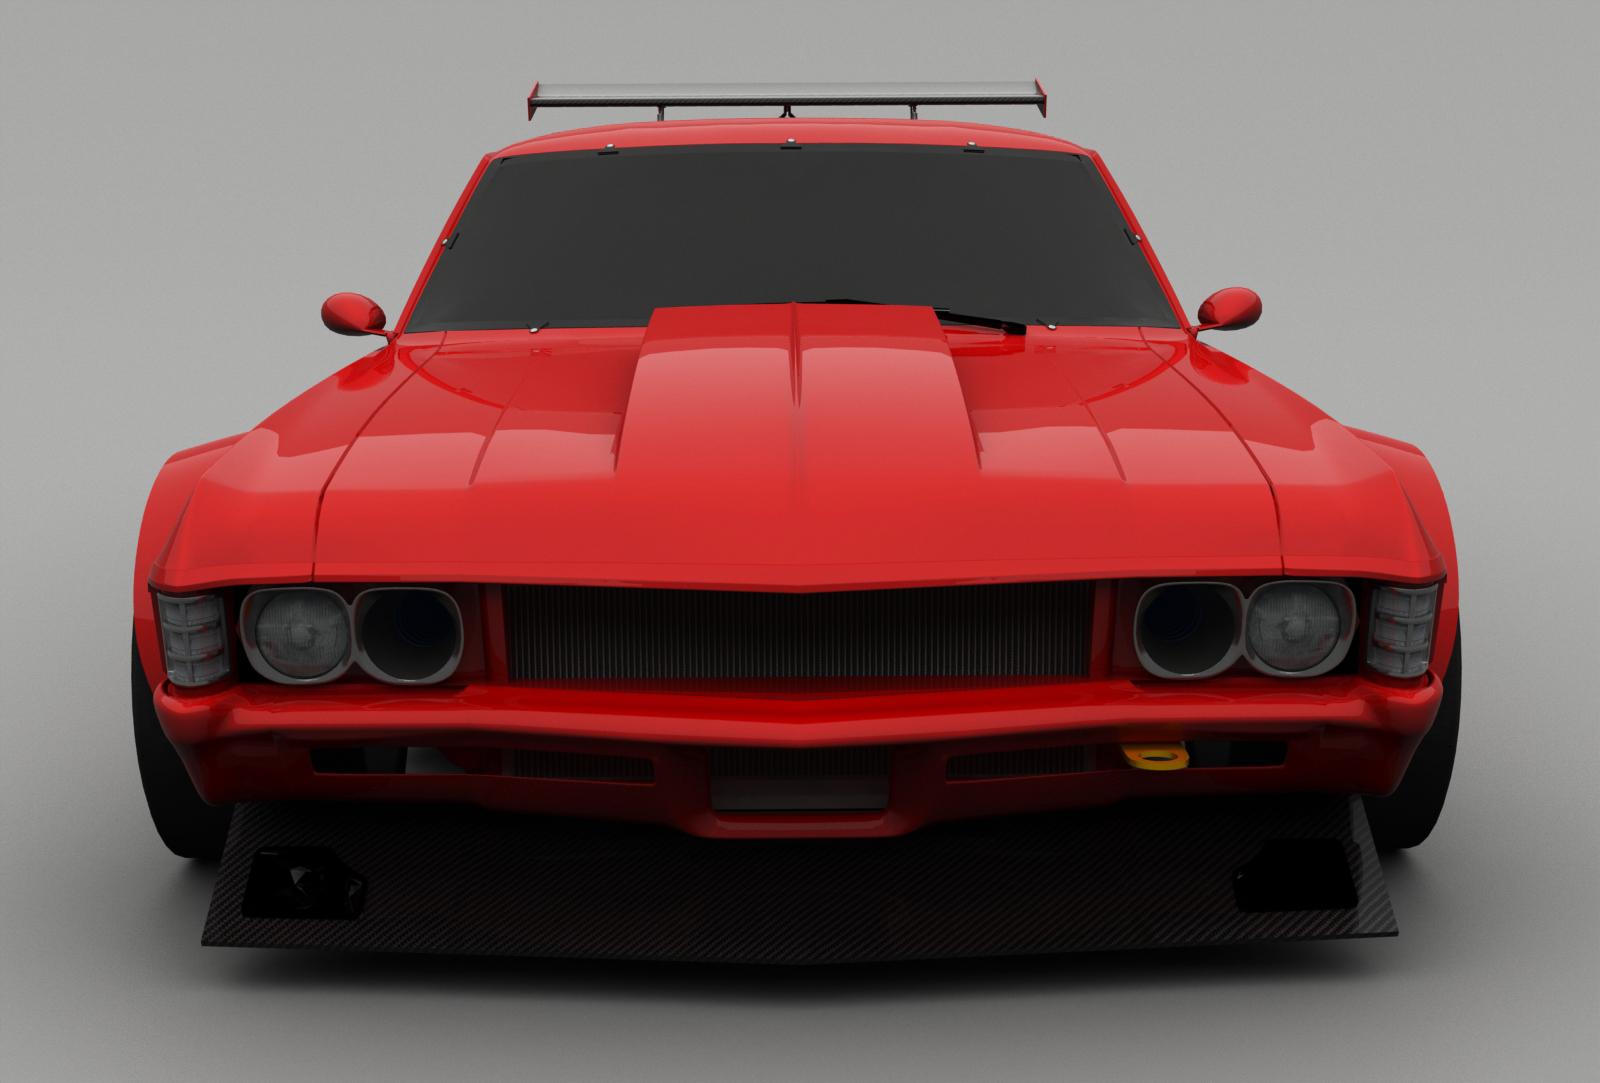 2013-03_The Crew_F.Beudin_Chevrolet Impala-1967-Racing_04